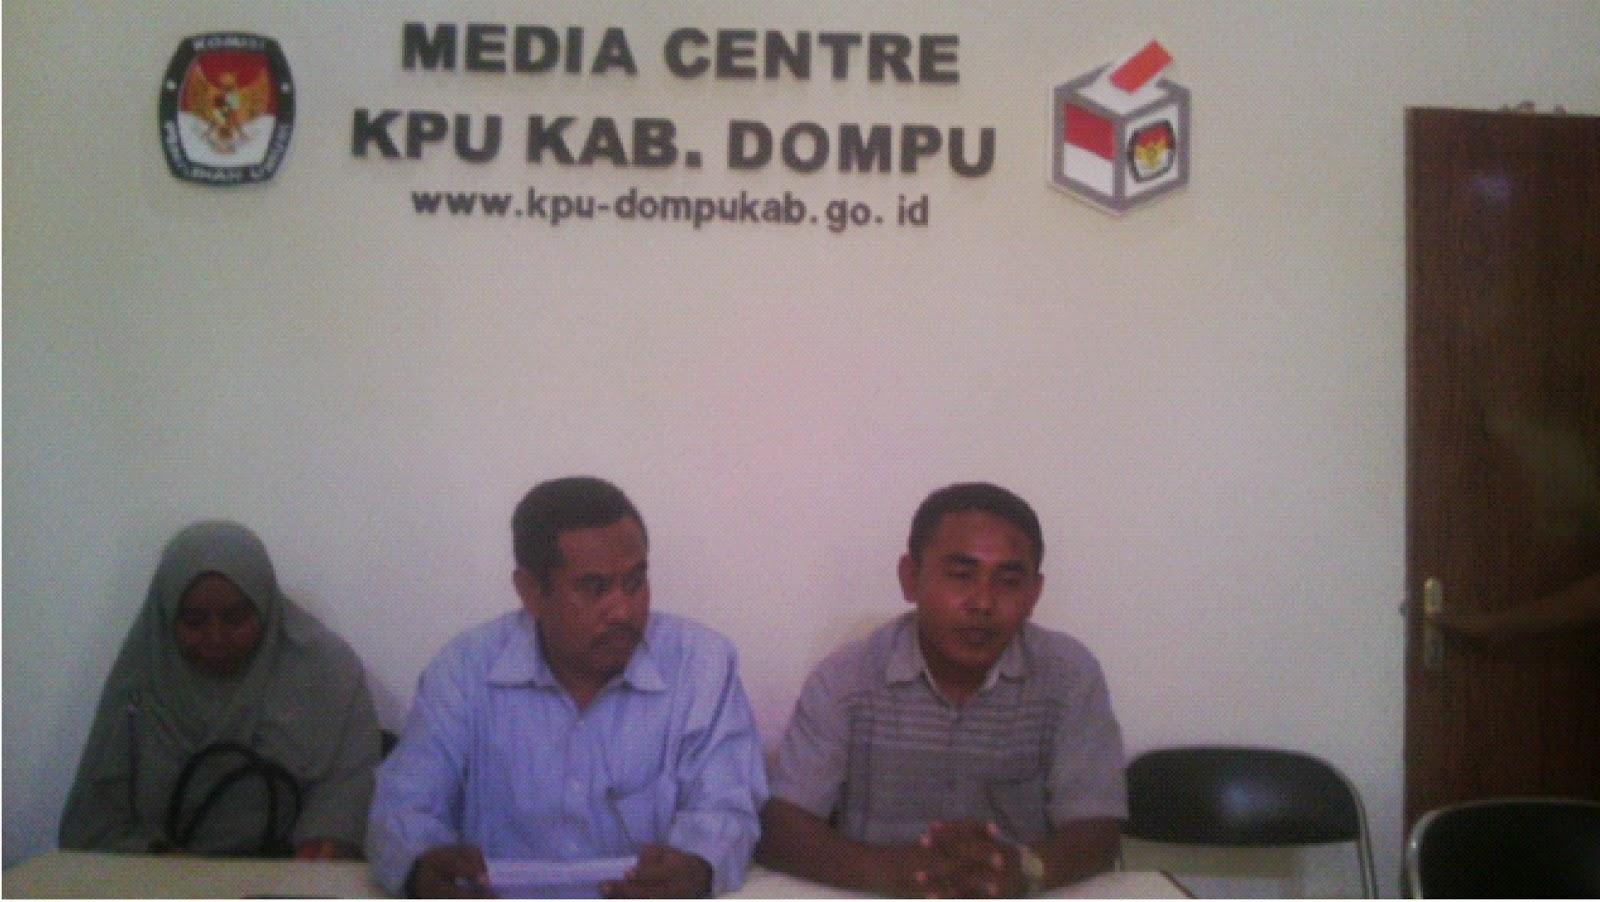 KPU: Pilkada Dompu  Digelar 9 Desember 2015